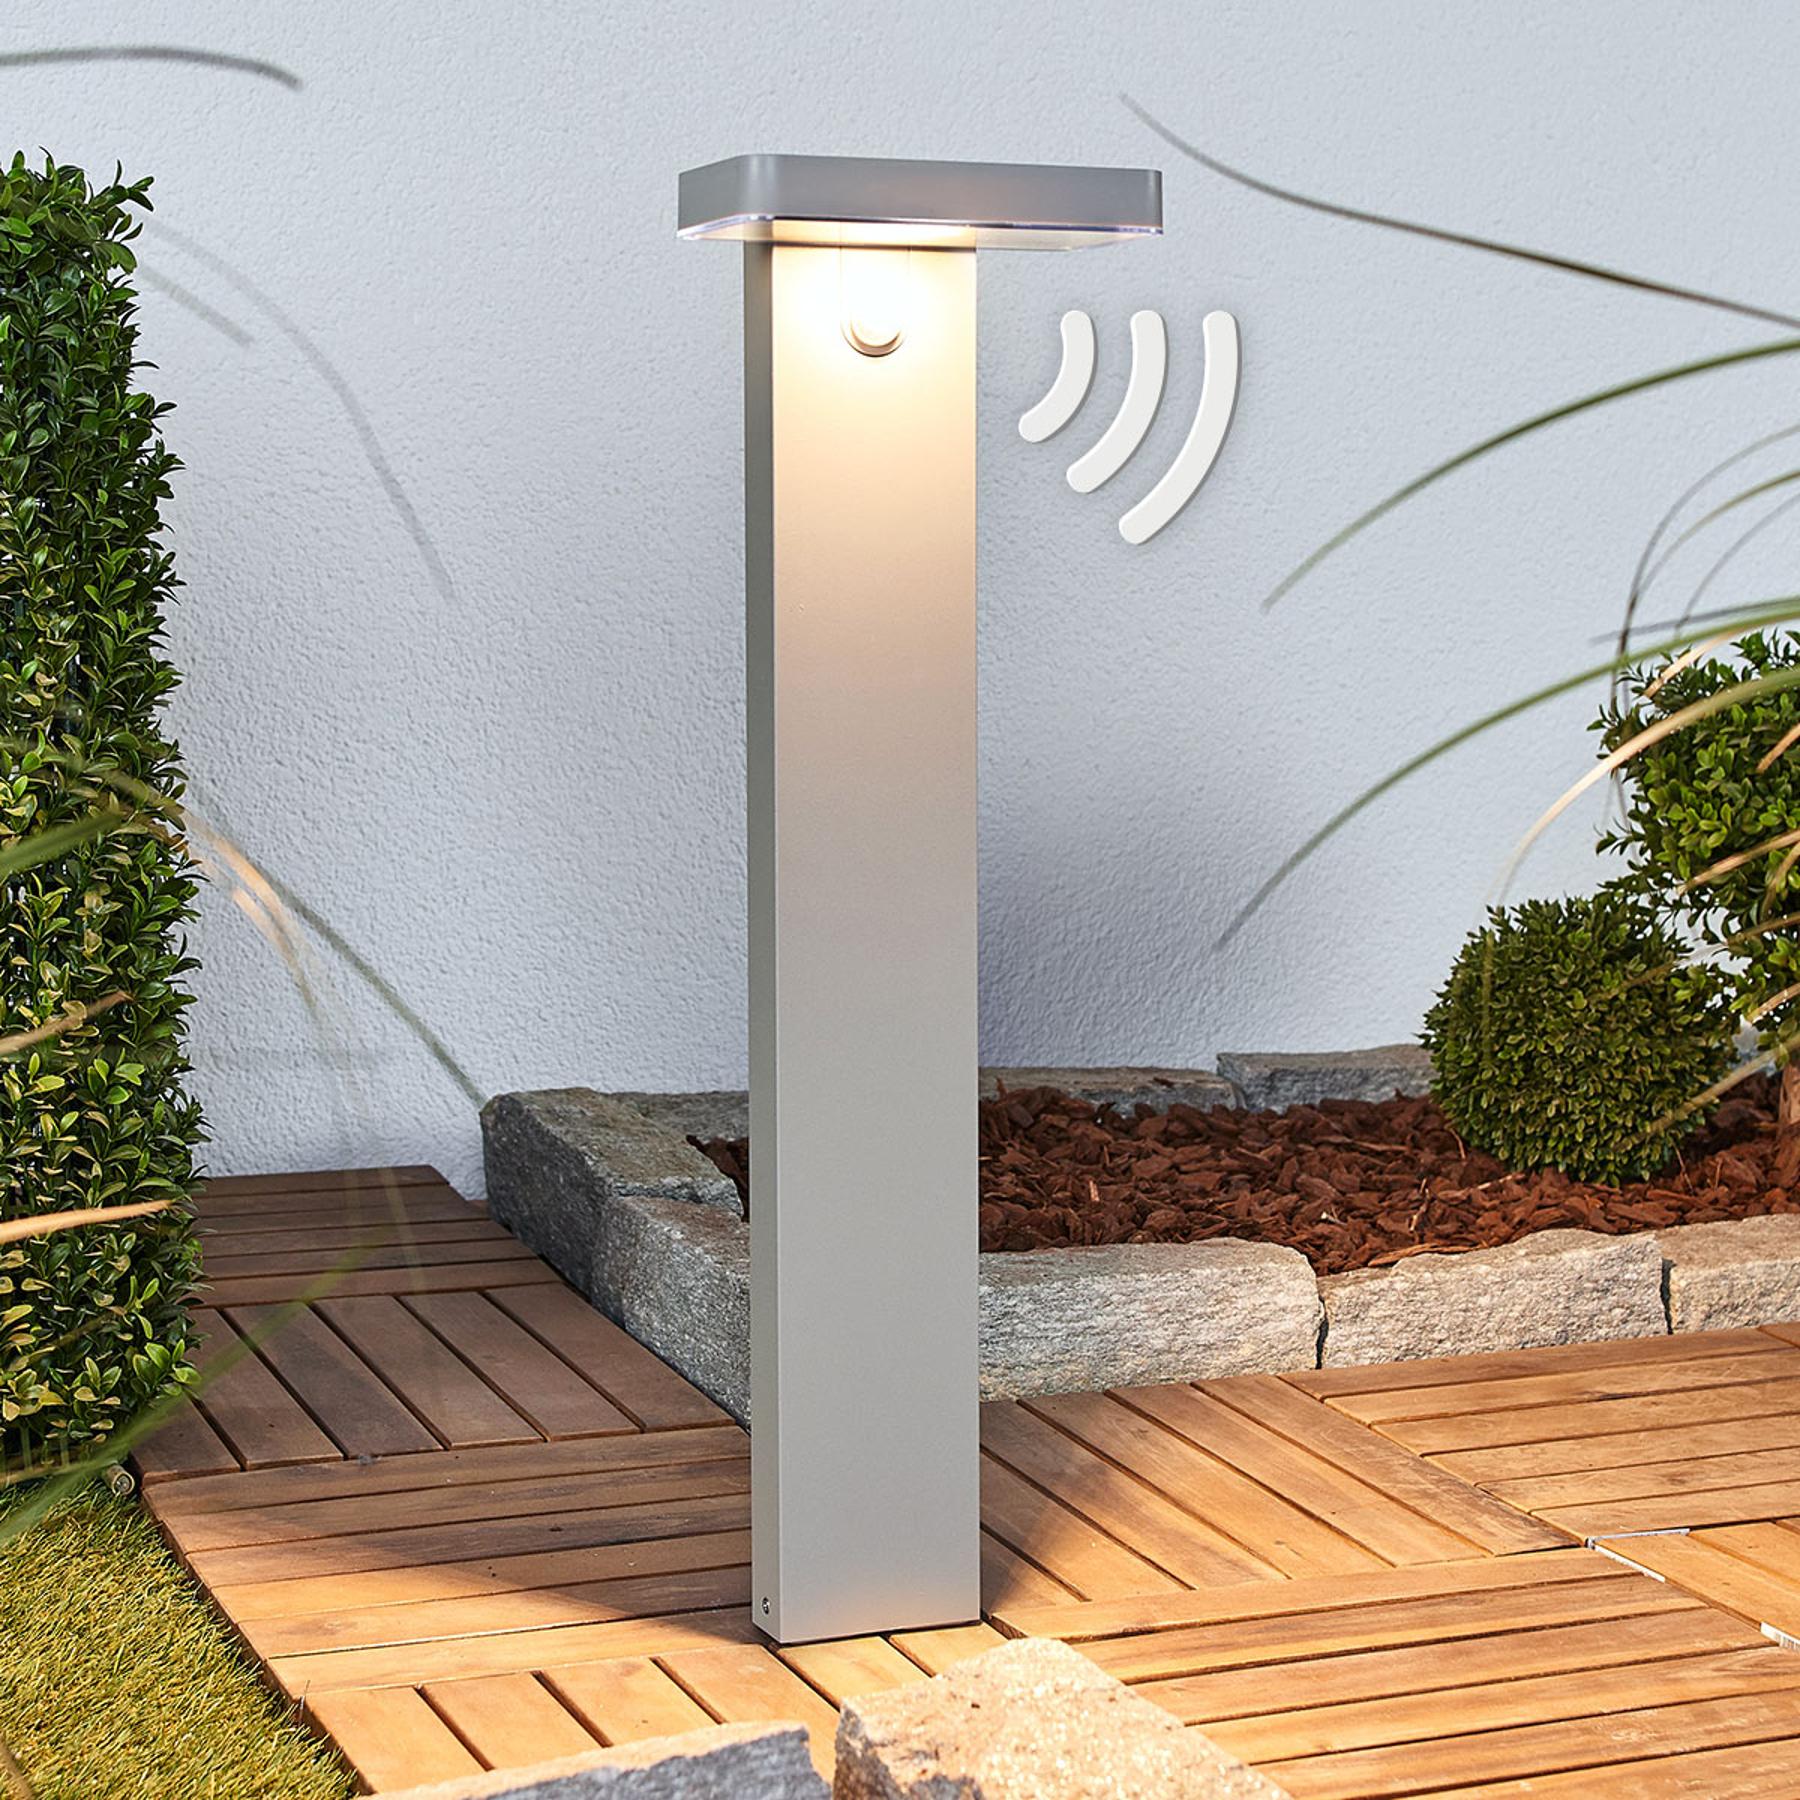 LED-Sockelleuchte Maik mit Sensor, Solarbetrieb